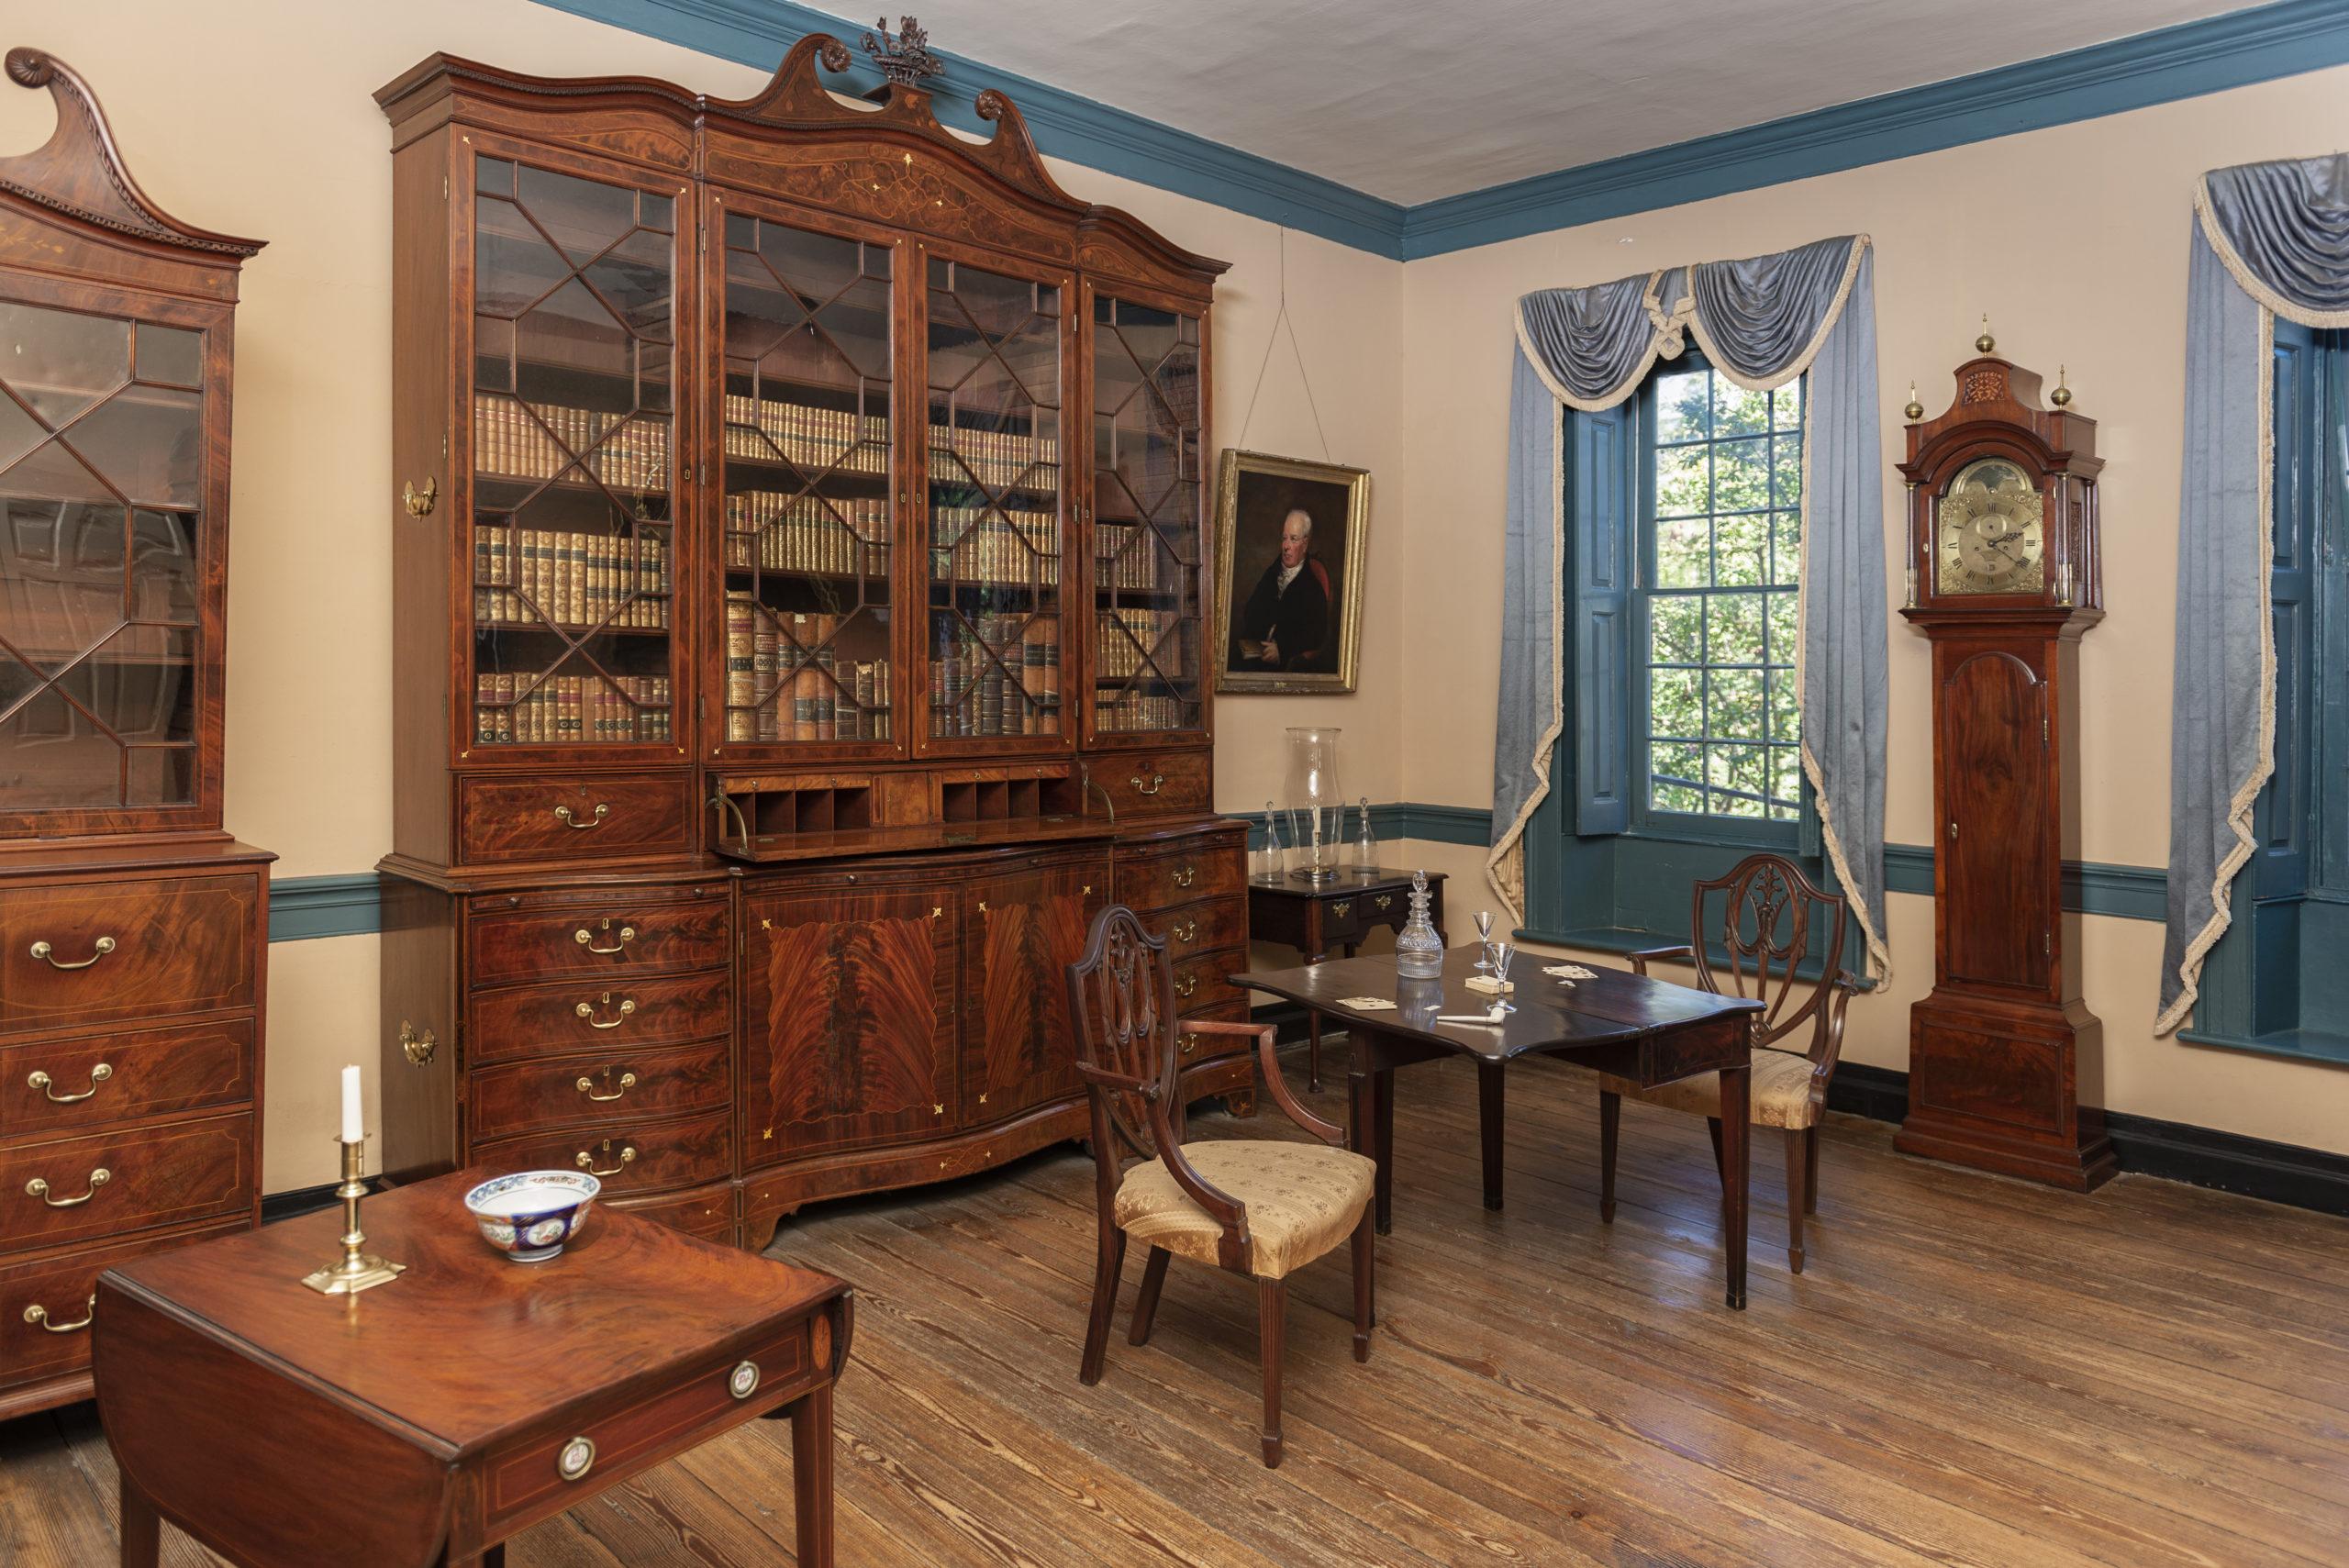 Women's History Tour at the Heyward-Washington House